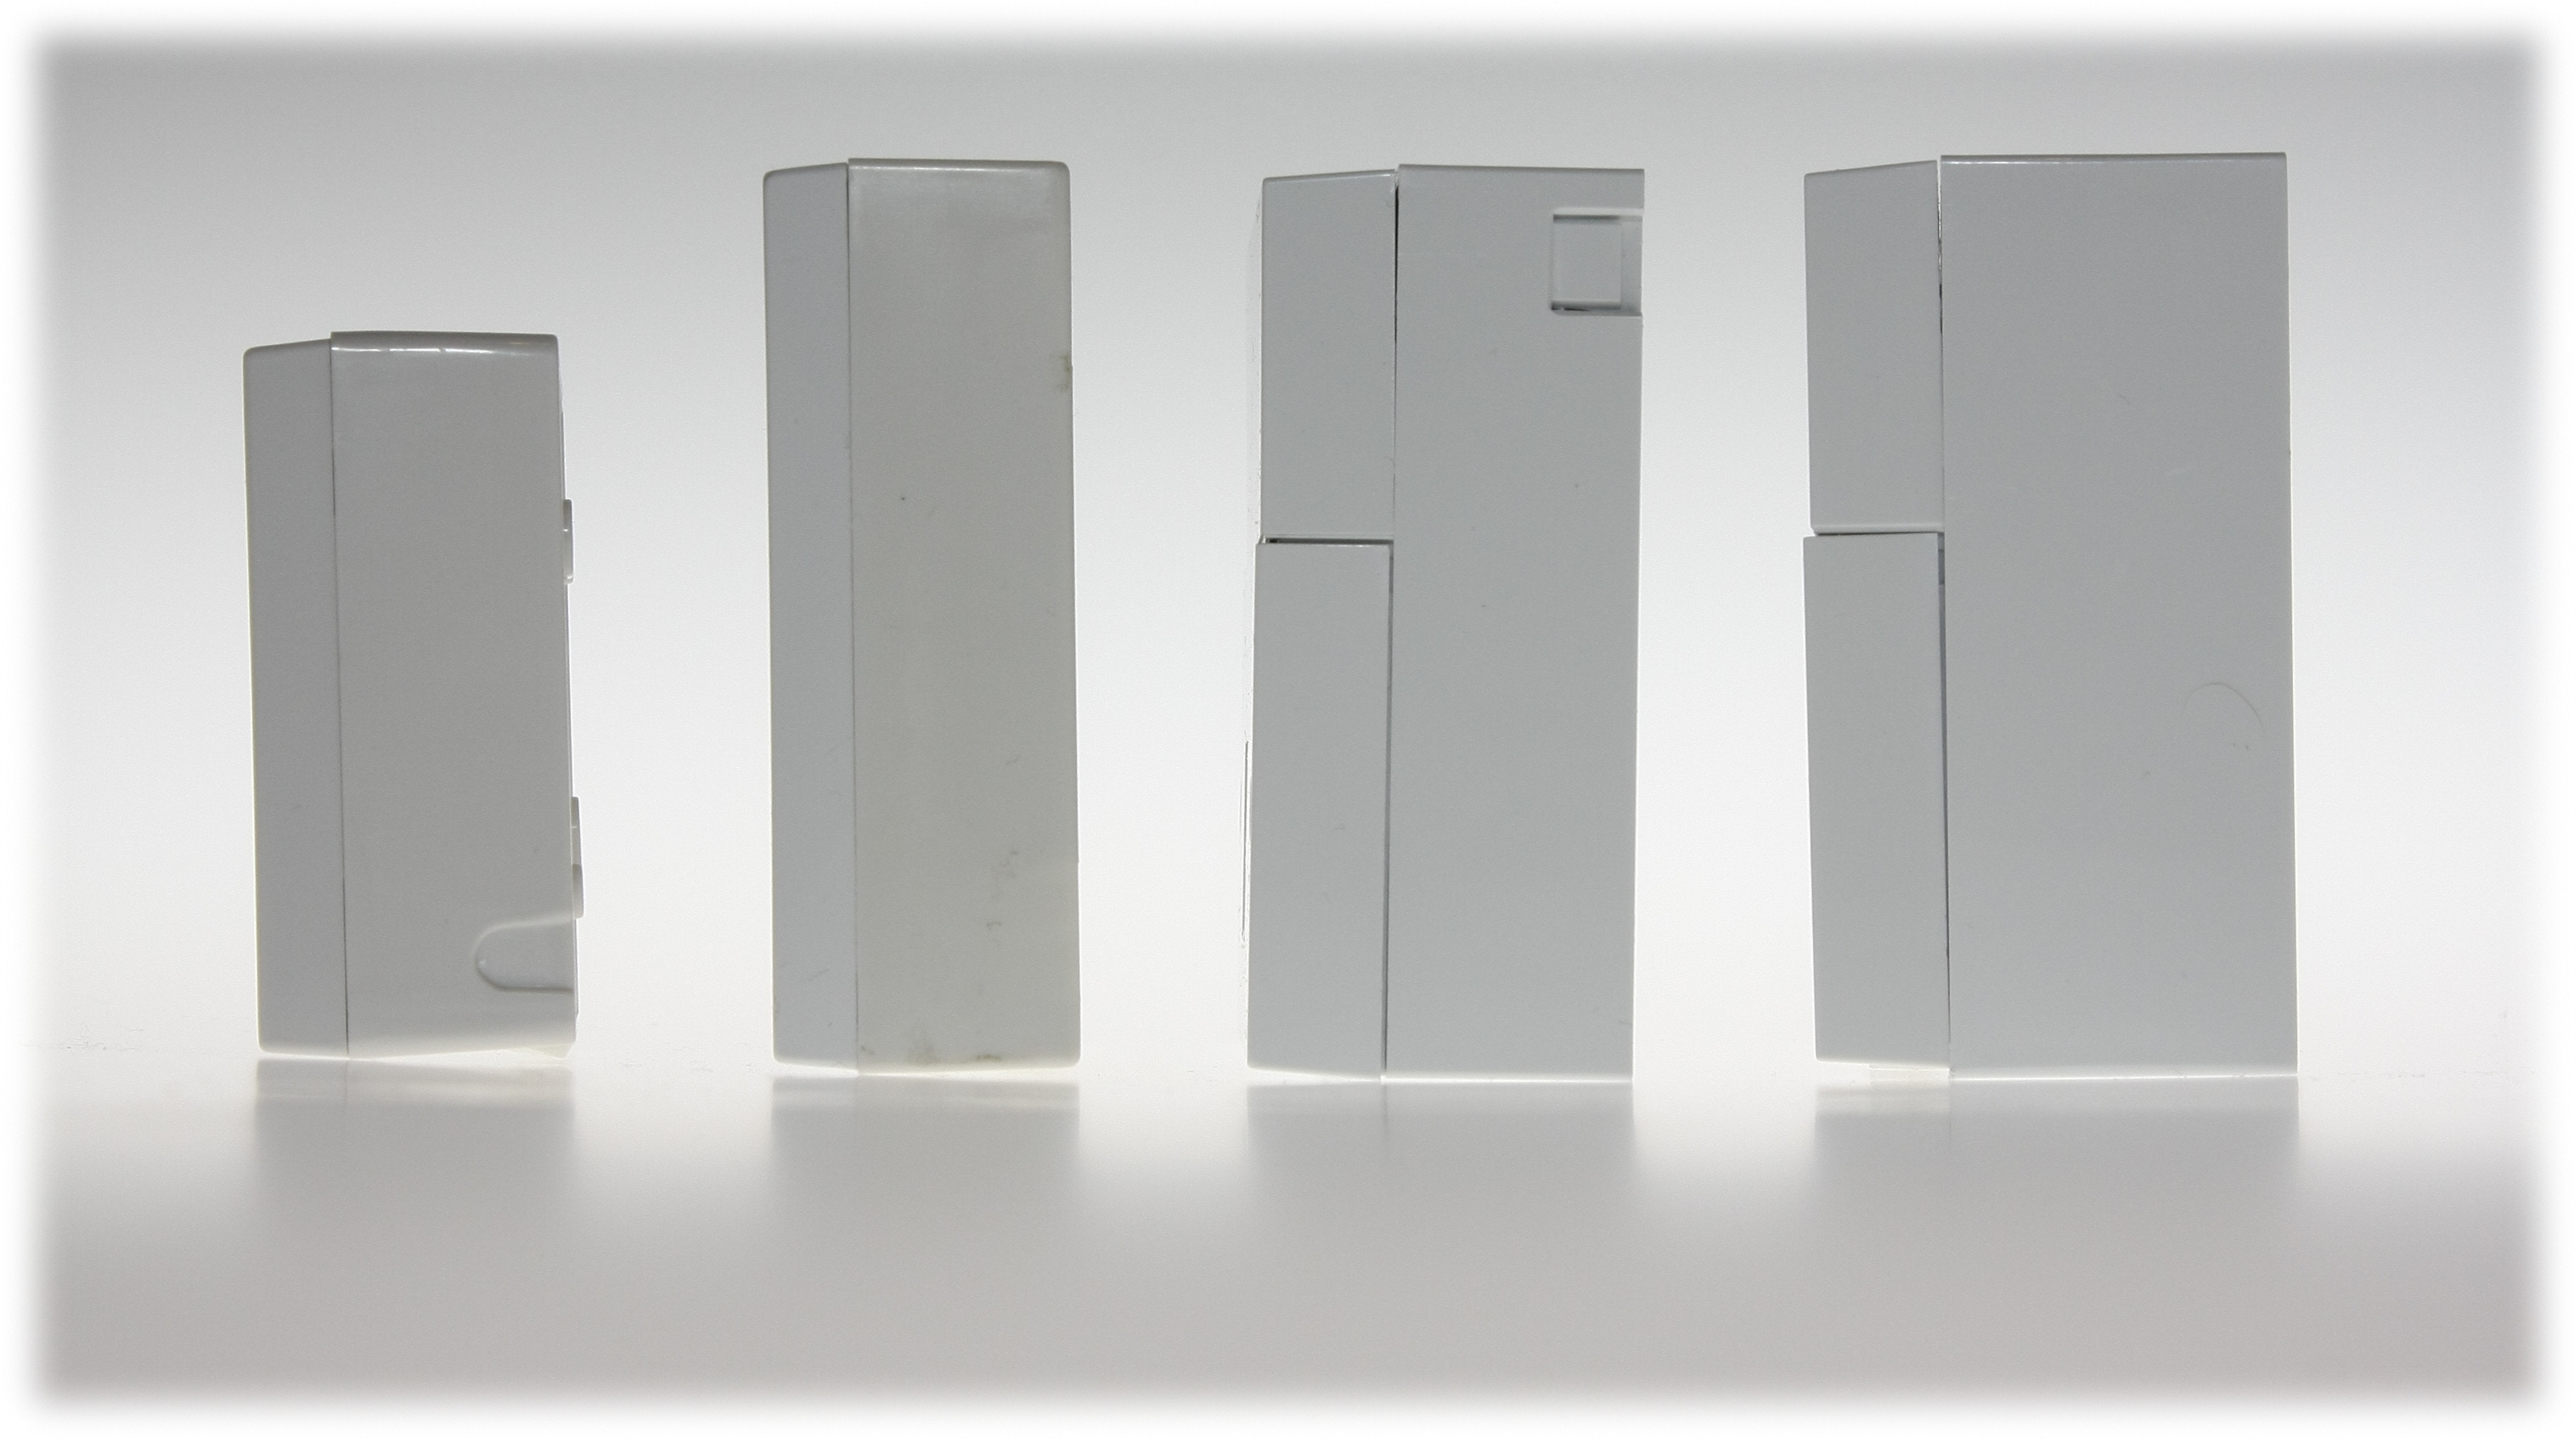 Telephone Box Wiring Diagram Dolgular Carling Switches Wiring Diagram